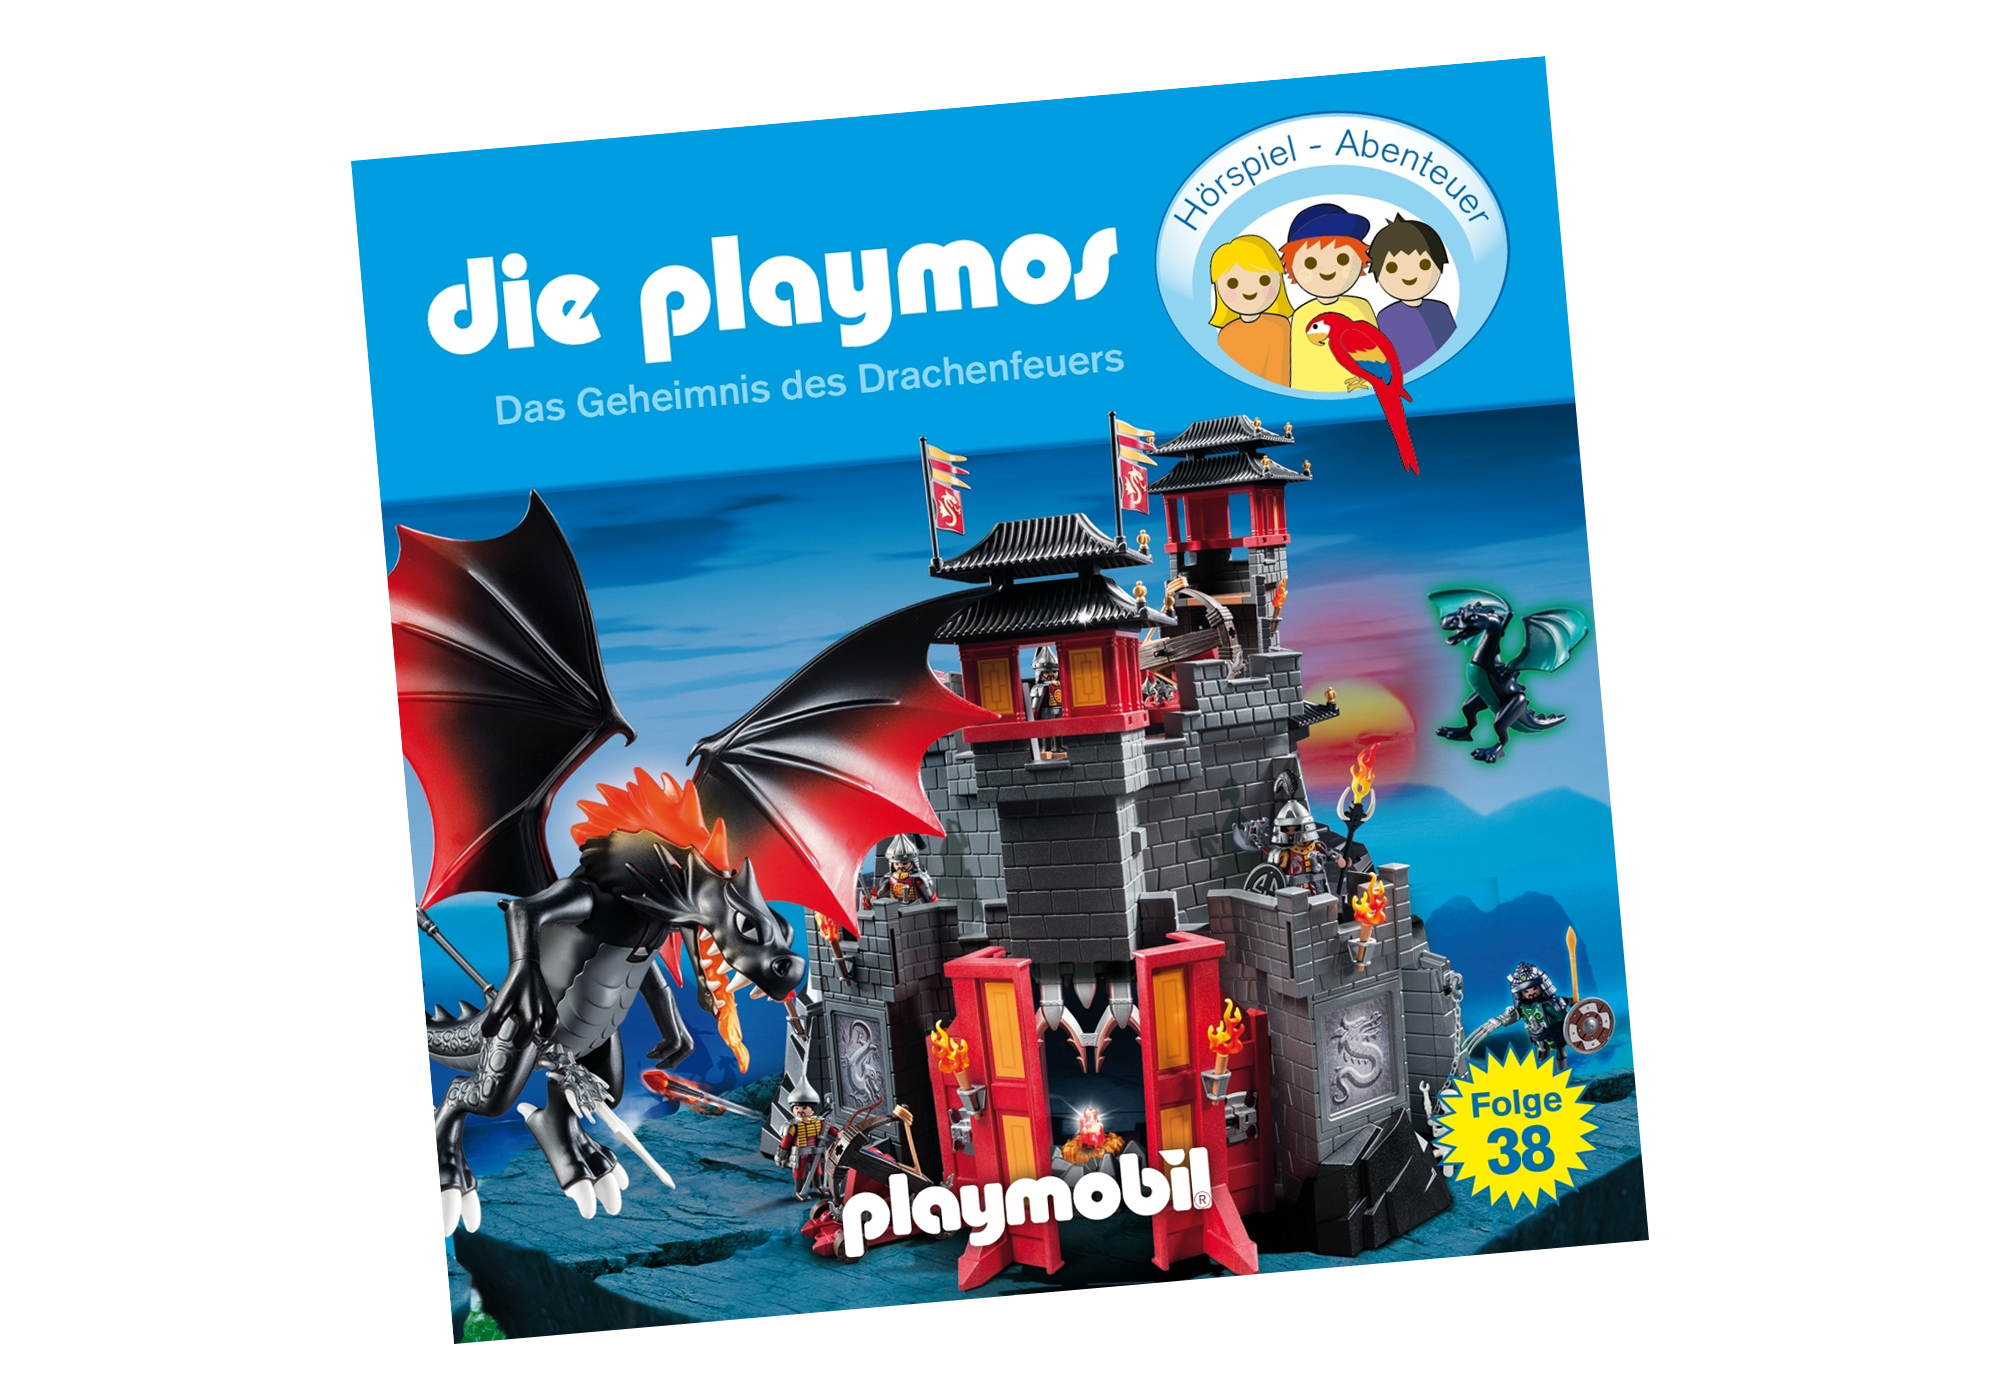 http://media.playmobil.com/i/playmobil/80451_product_detail/Das Geheimnis des Drachenfeuers (38) - CD